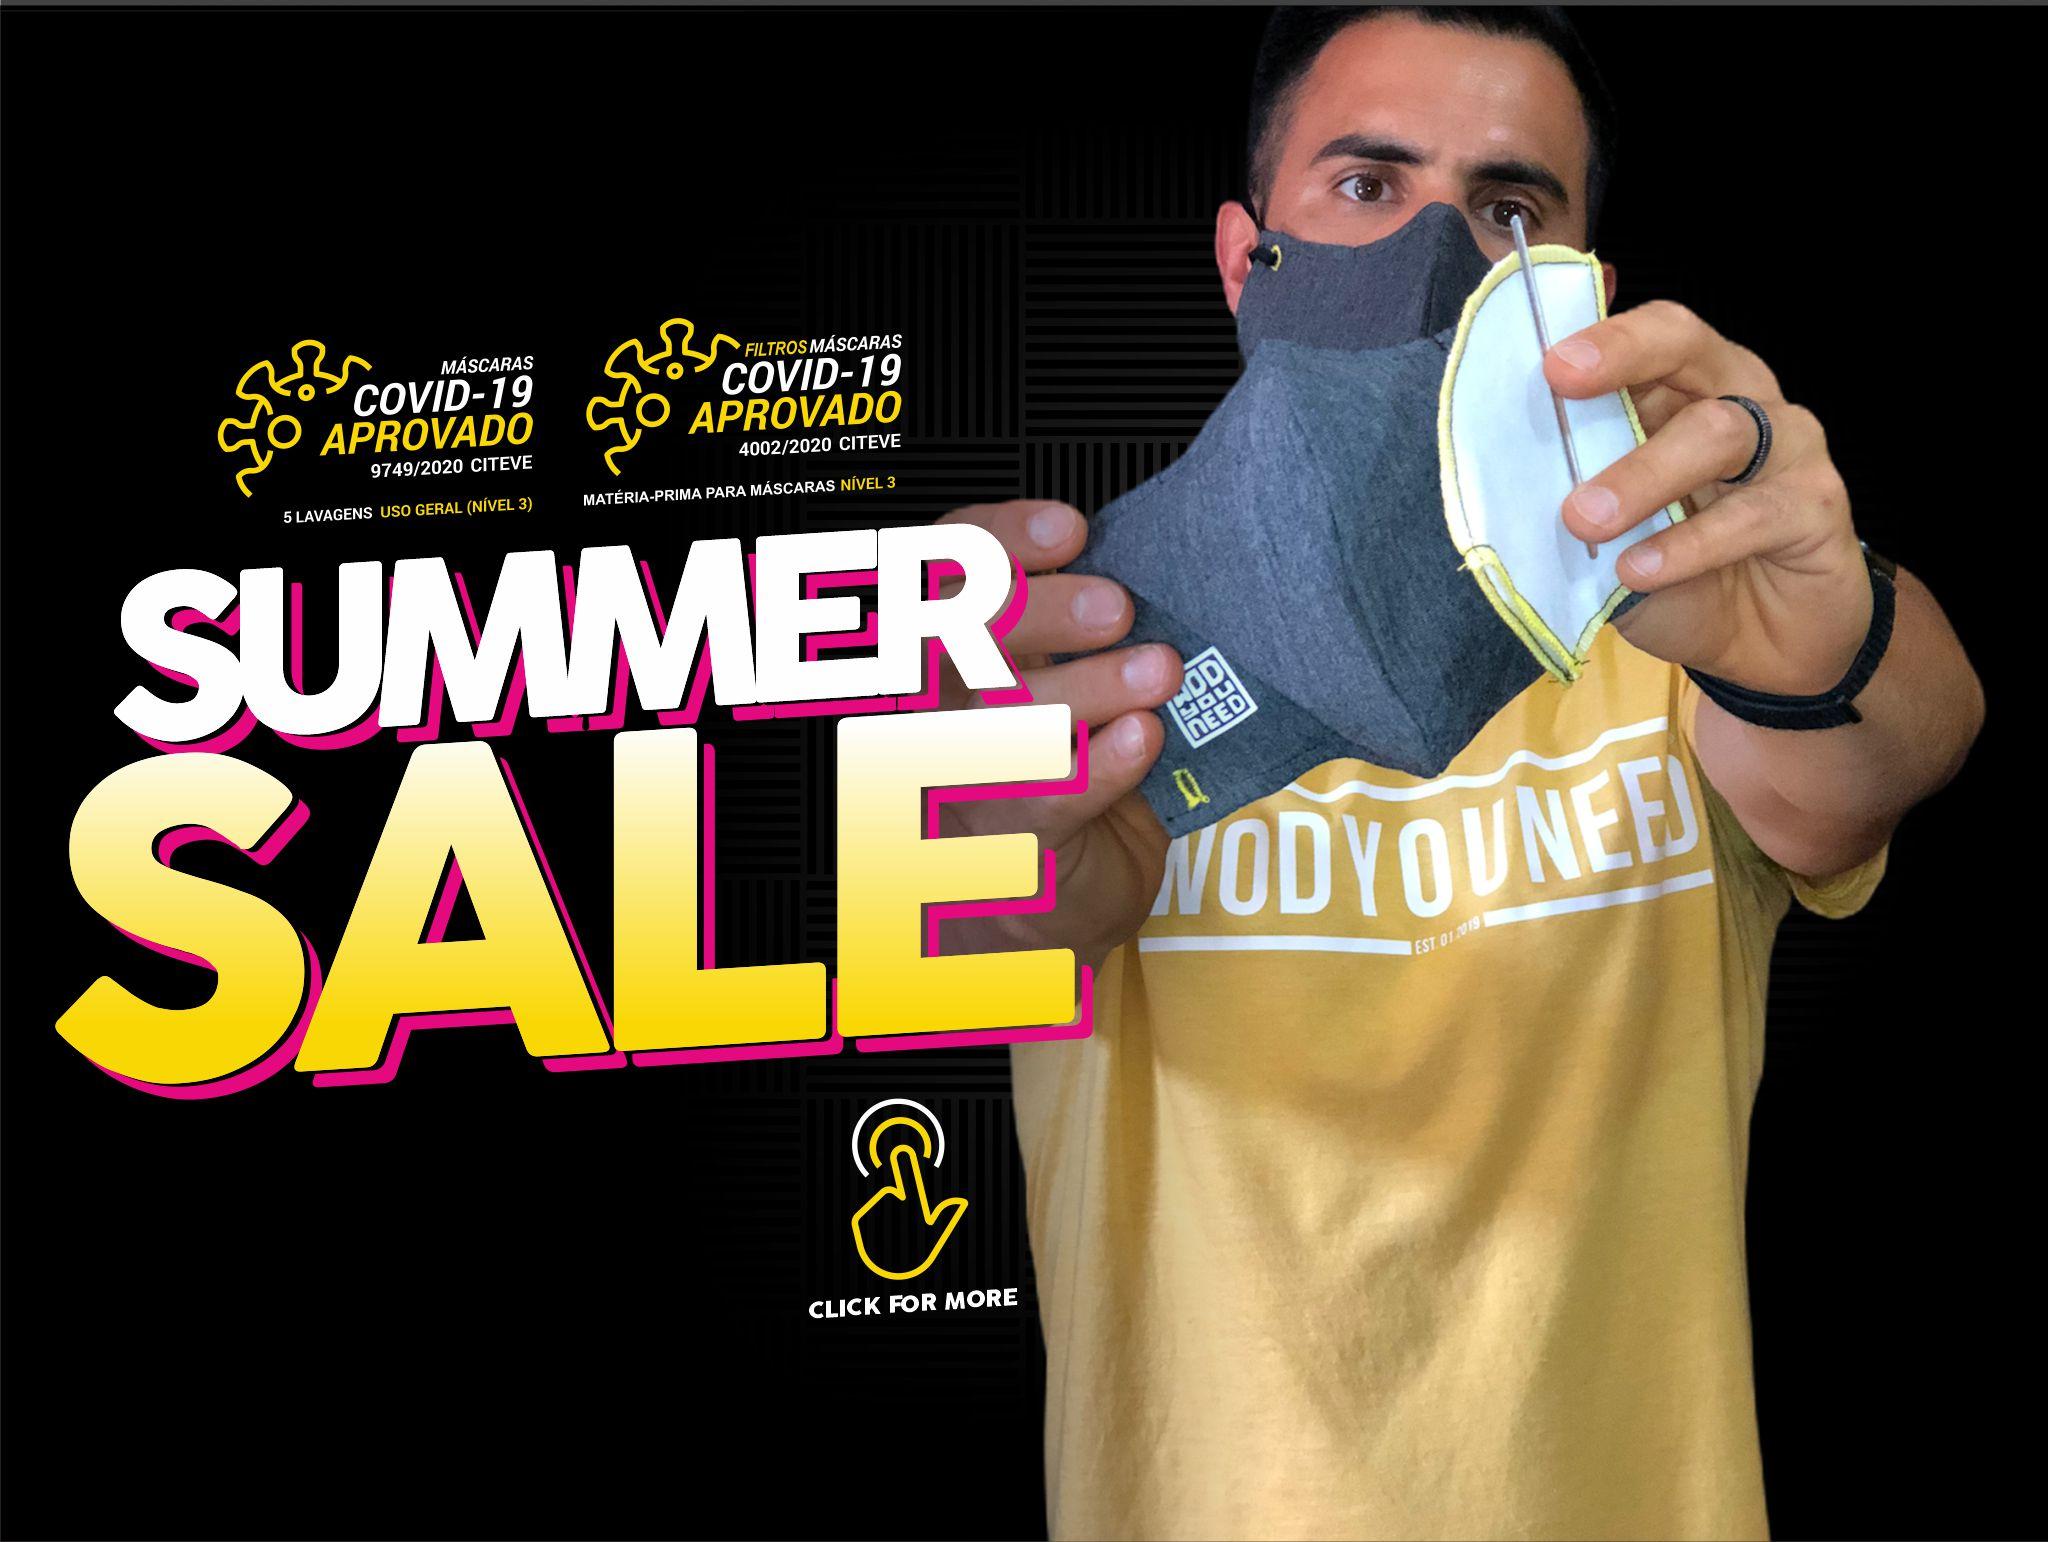 wyn-summer-sale2020-mask-mobile